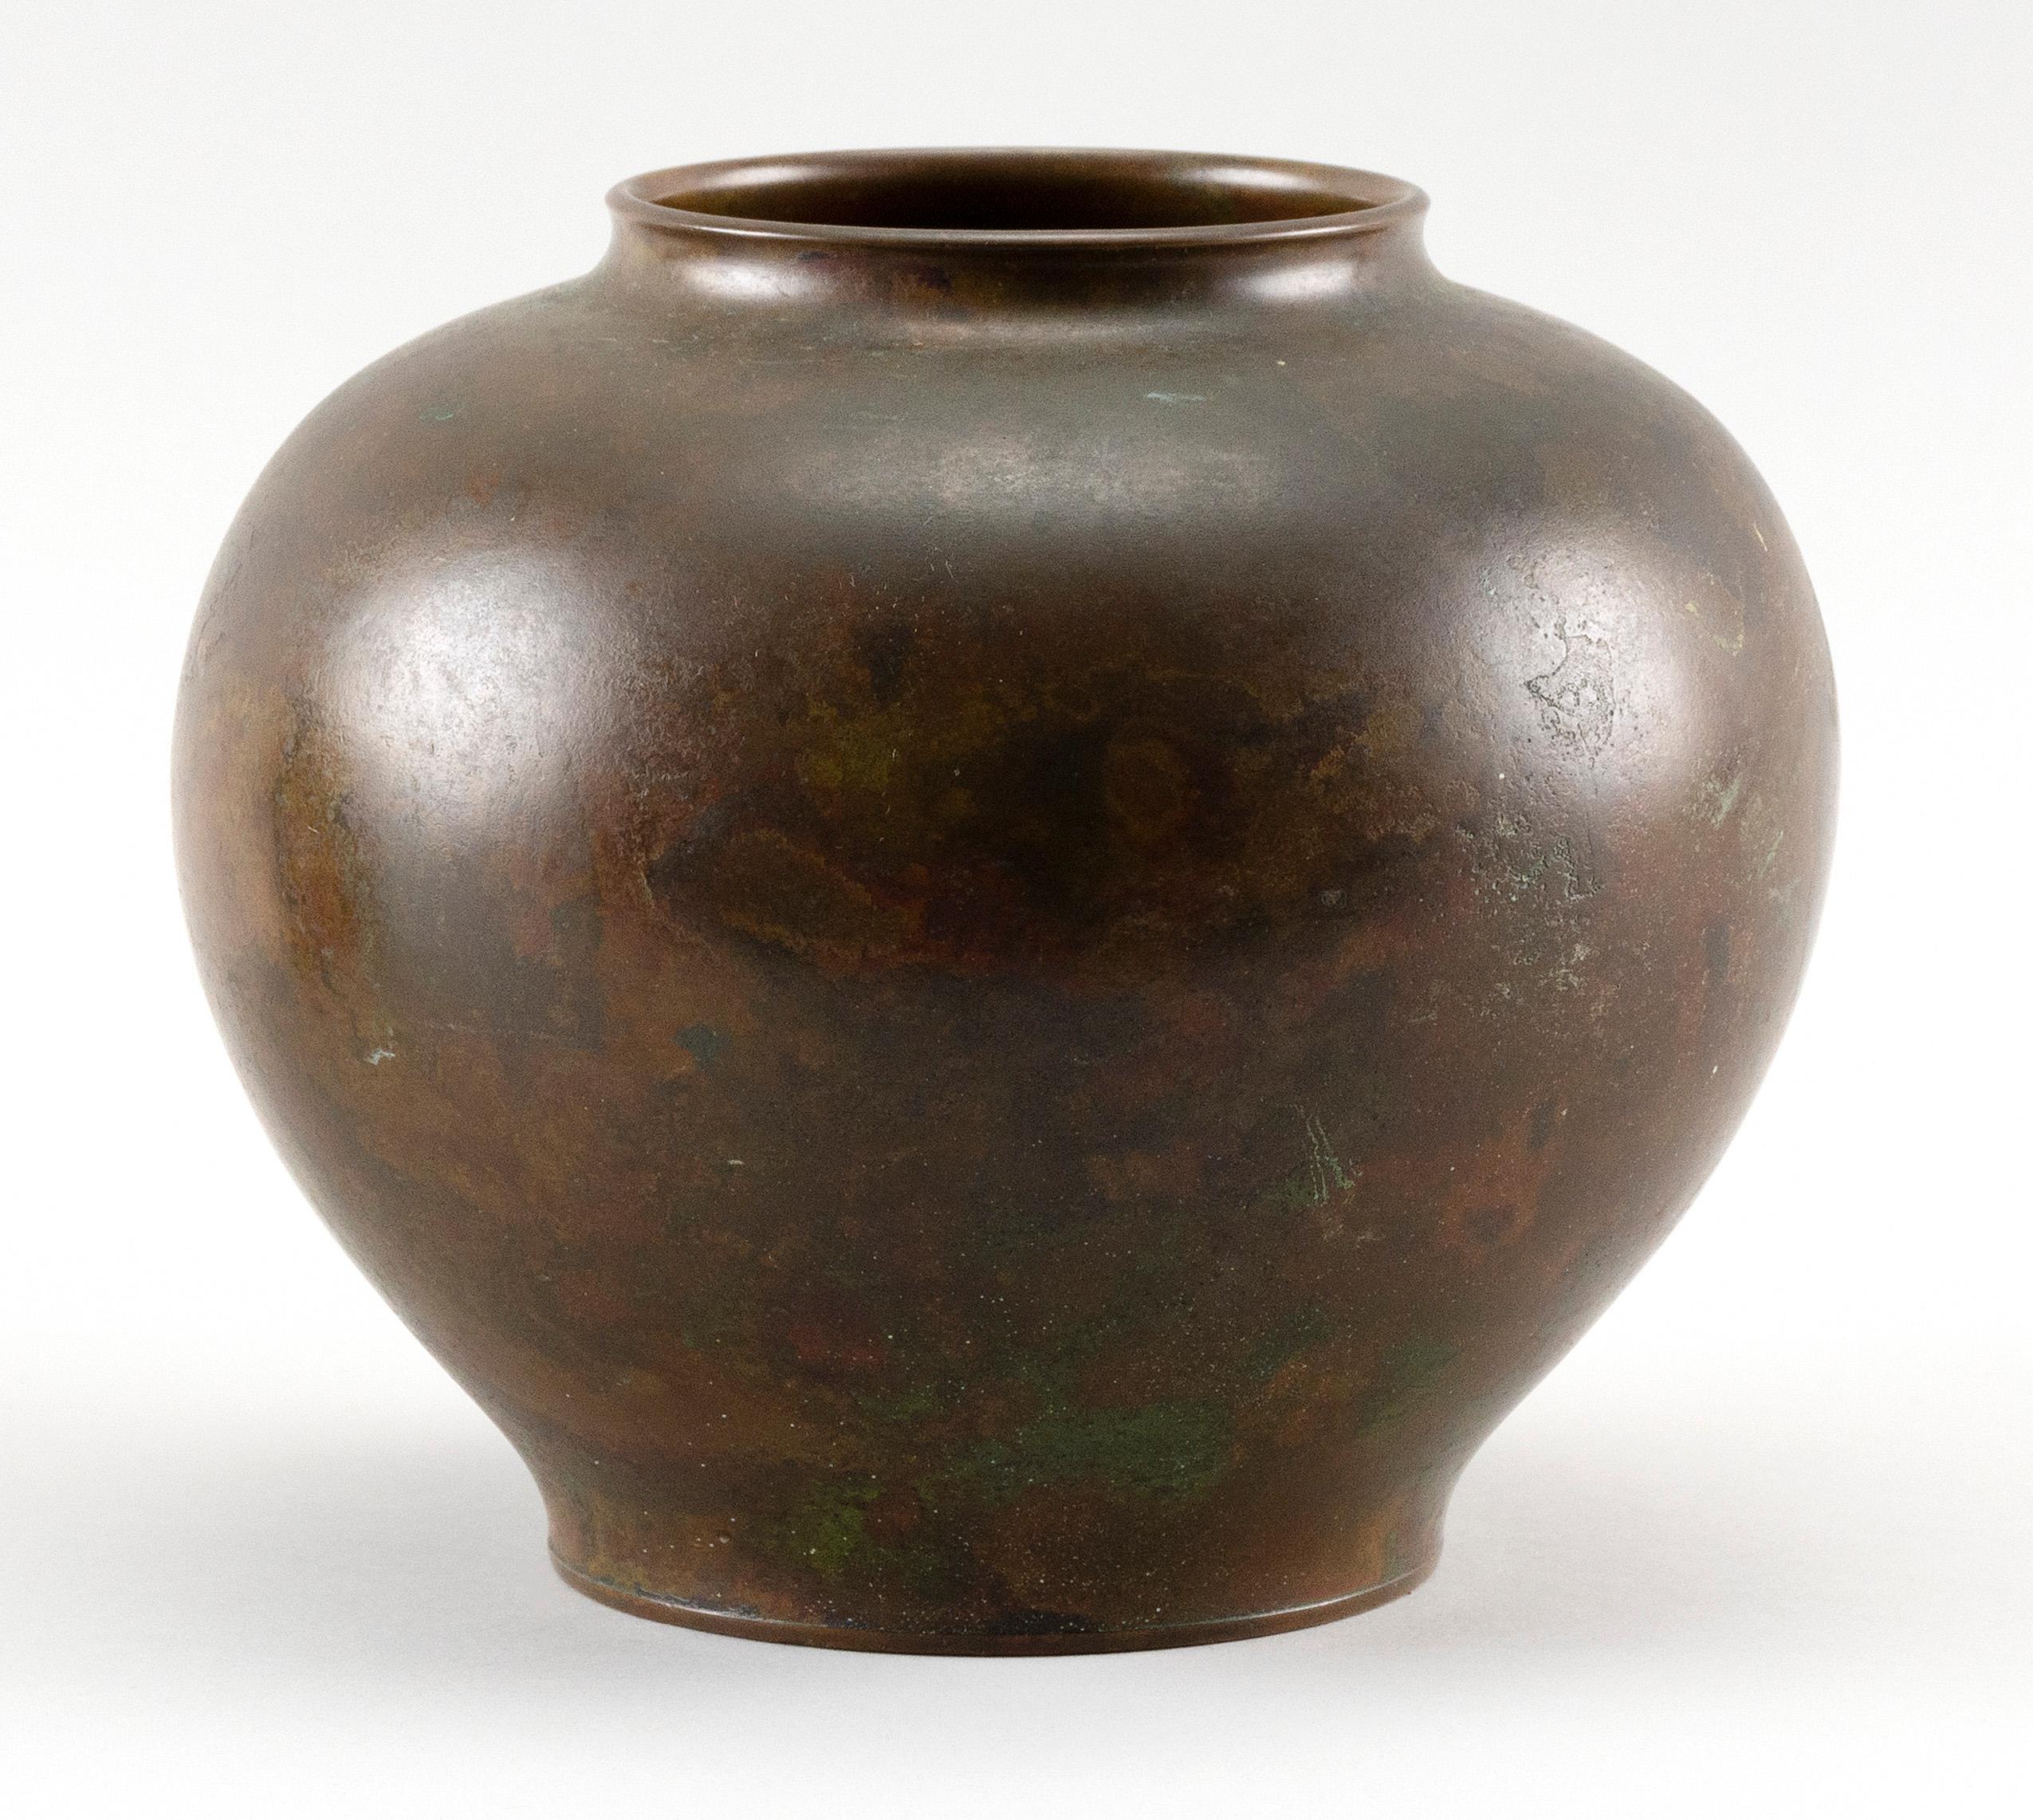 "JAPANESE BRONZE VASE Ovoid, with marbled patina. Marked on base. Height 7""."